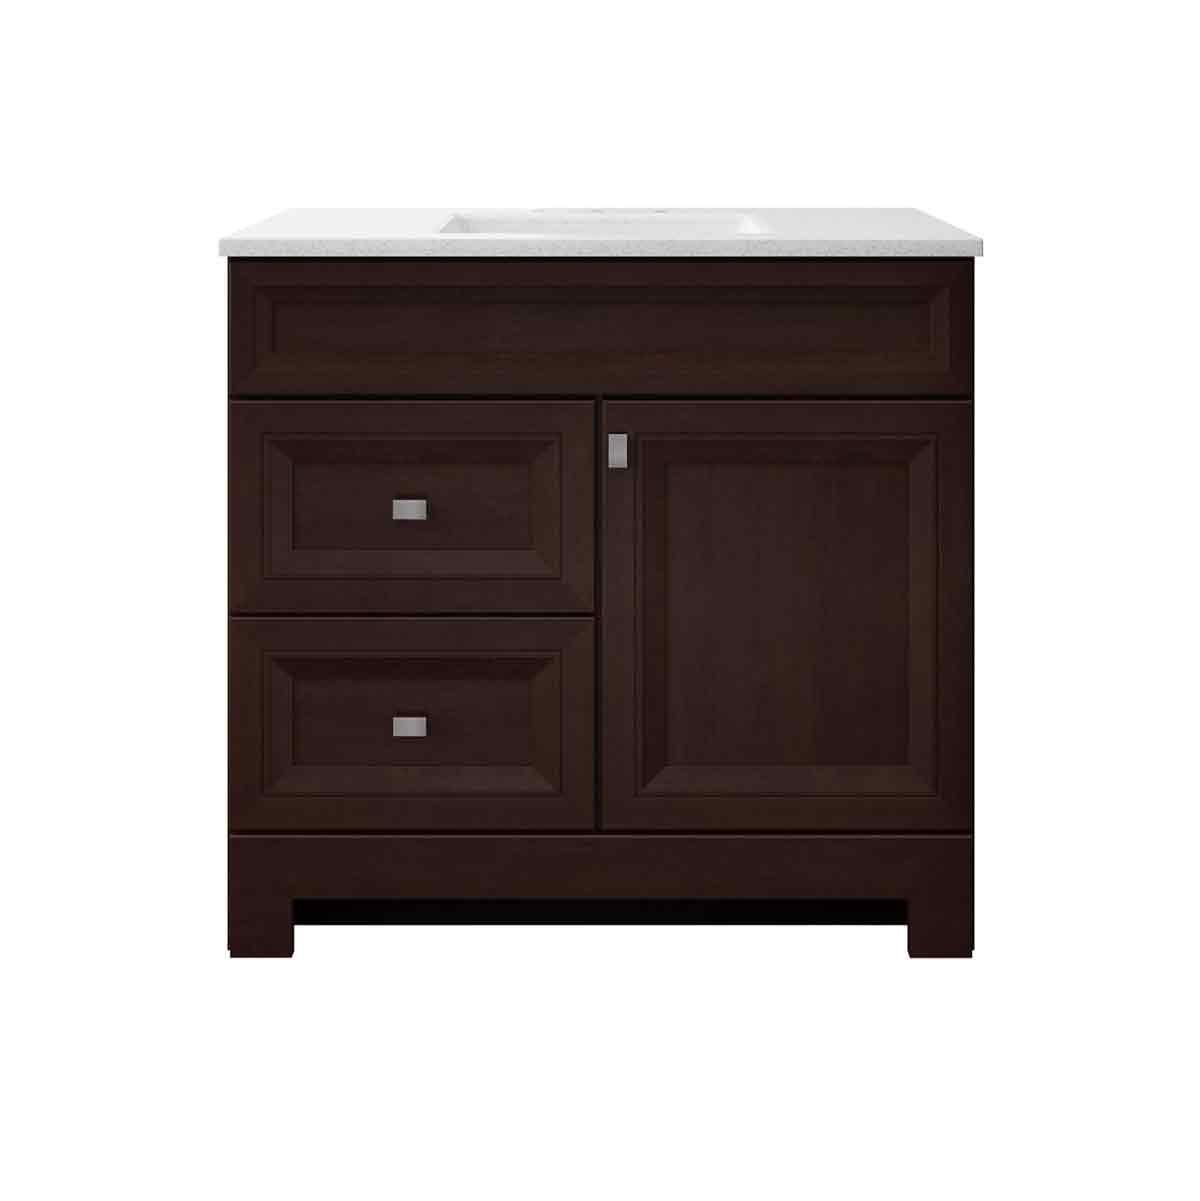 Home-Decorators-Collection-30-in-Sedgewood-Bath-Vanities-by-American-Woodmark